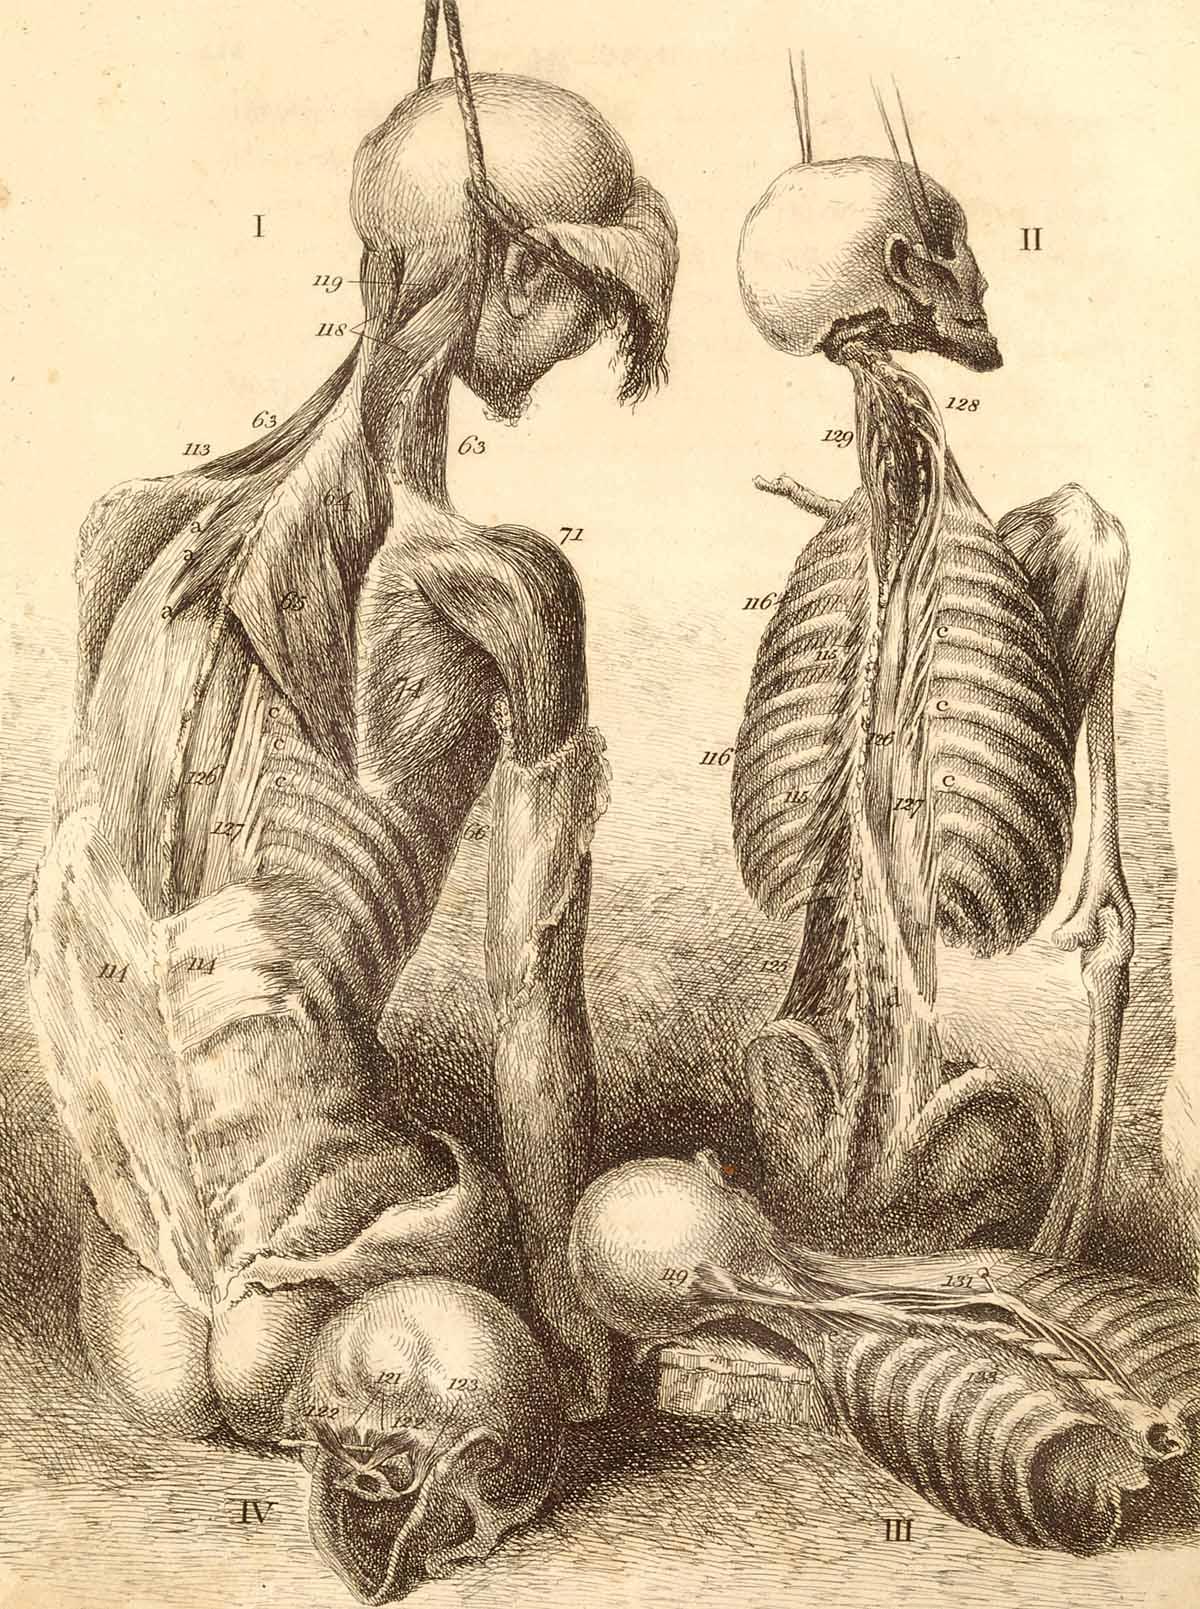 Anatomy Skeleton Drawing Back View of Two Skeletons